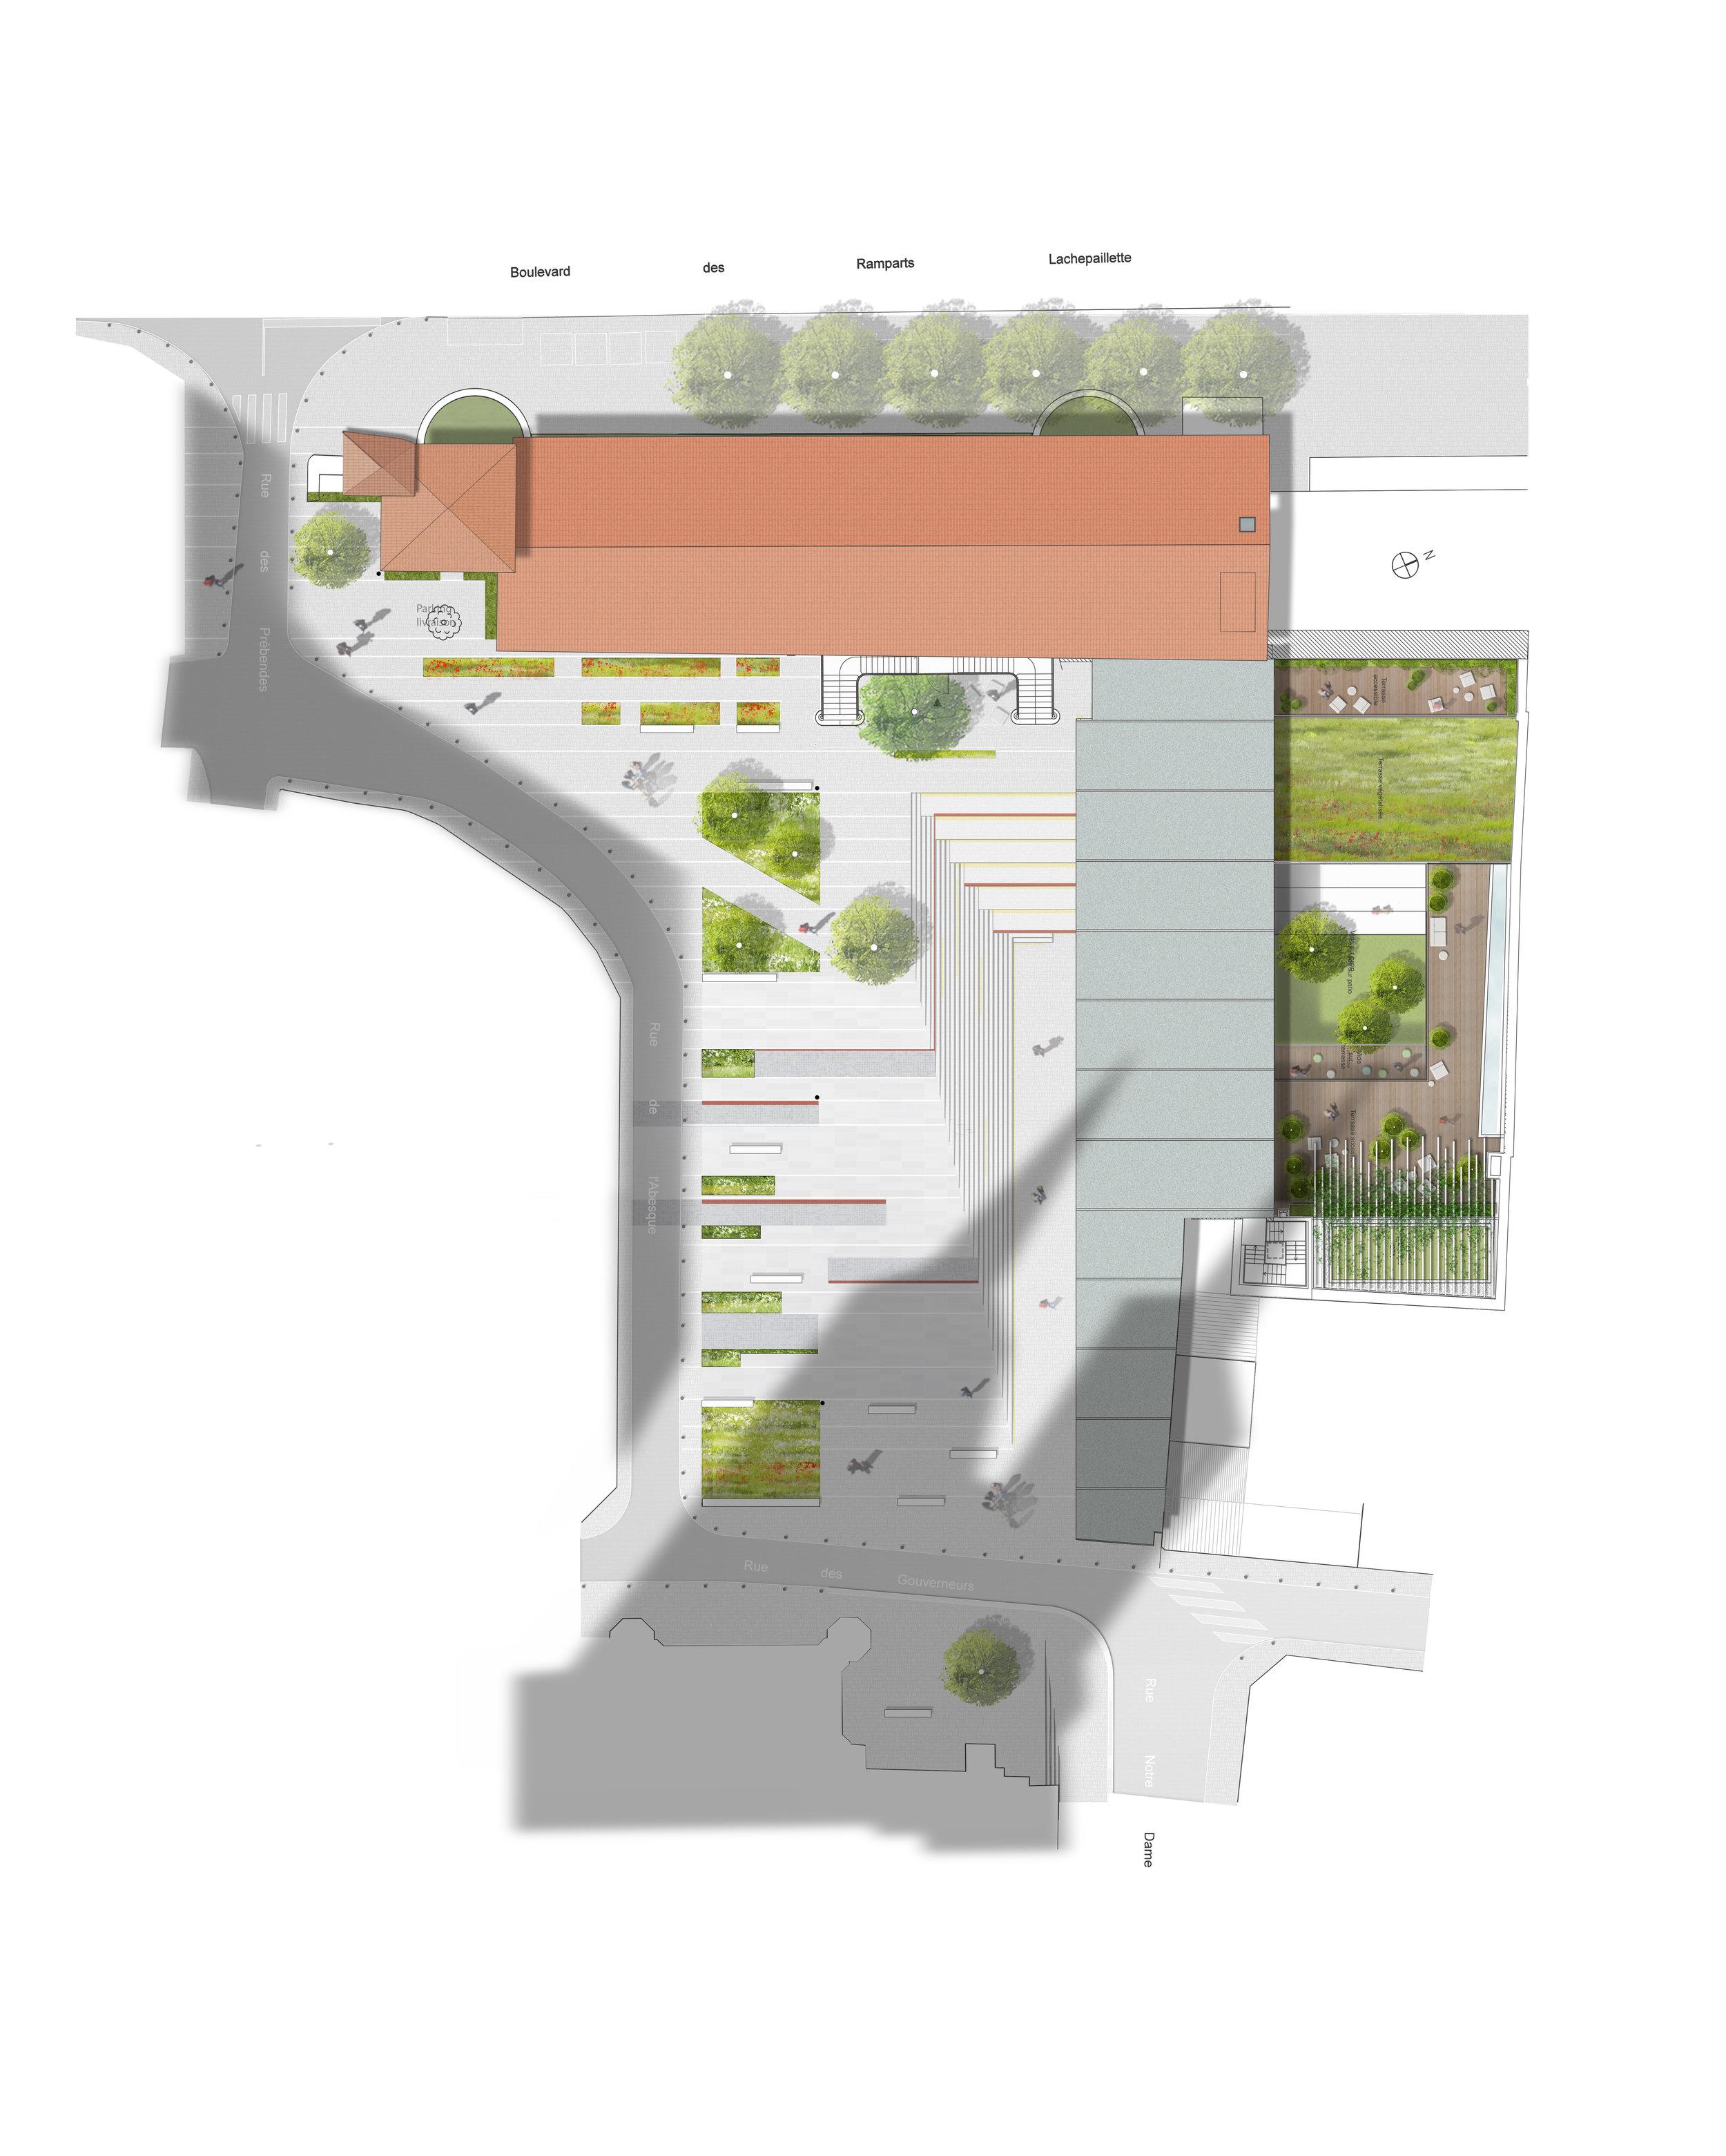 médiathèque_bayonne_public_outdoor_design_christophe_gautrand_paysagiste_2.jpg